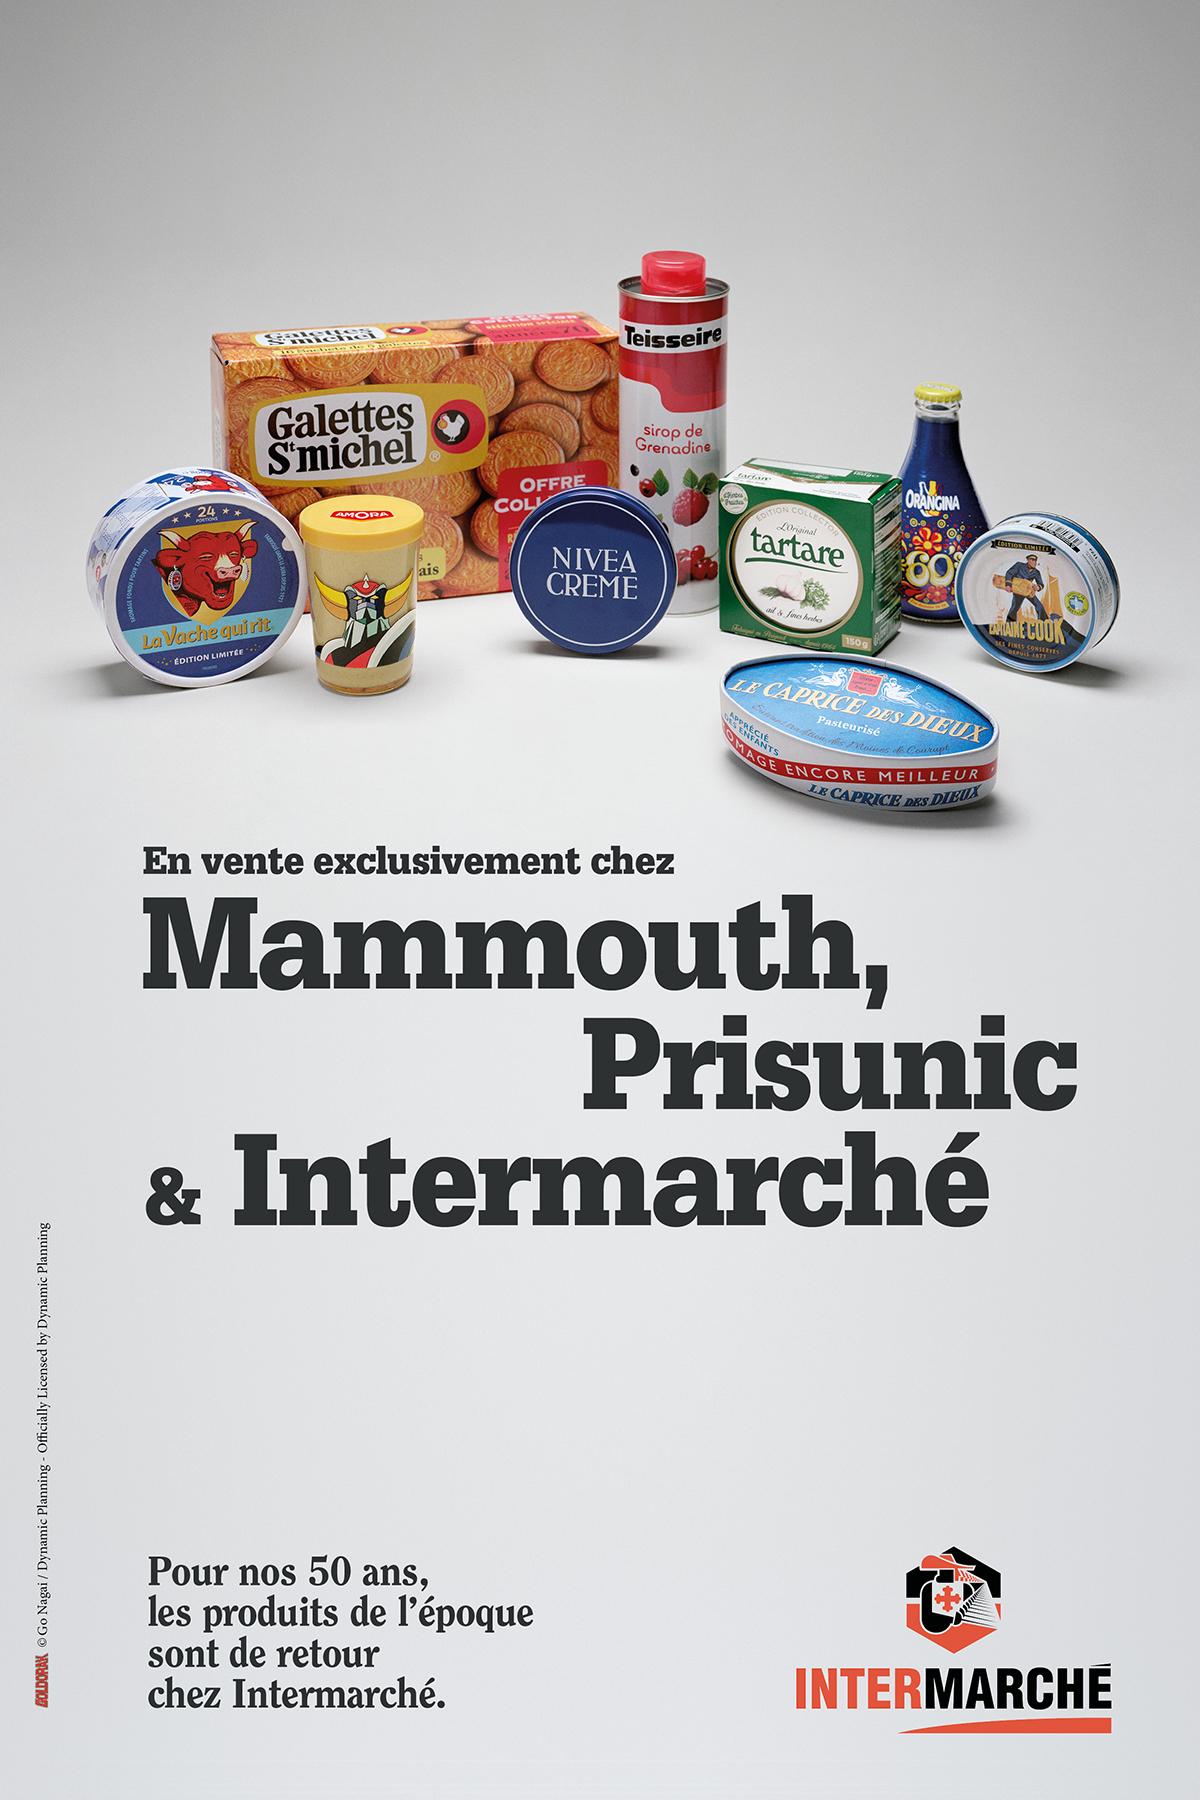 intermarche-50-ans-tf1-evelyne-leclercq-agence-romance-amora-capitaine-cook-caprice-des-dieux-galettes-st-michel-la-vache-qui-rit-nivea-orangina-tartare-teisseire-packaging-1960-1970